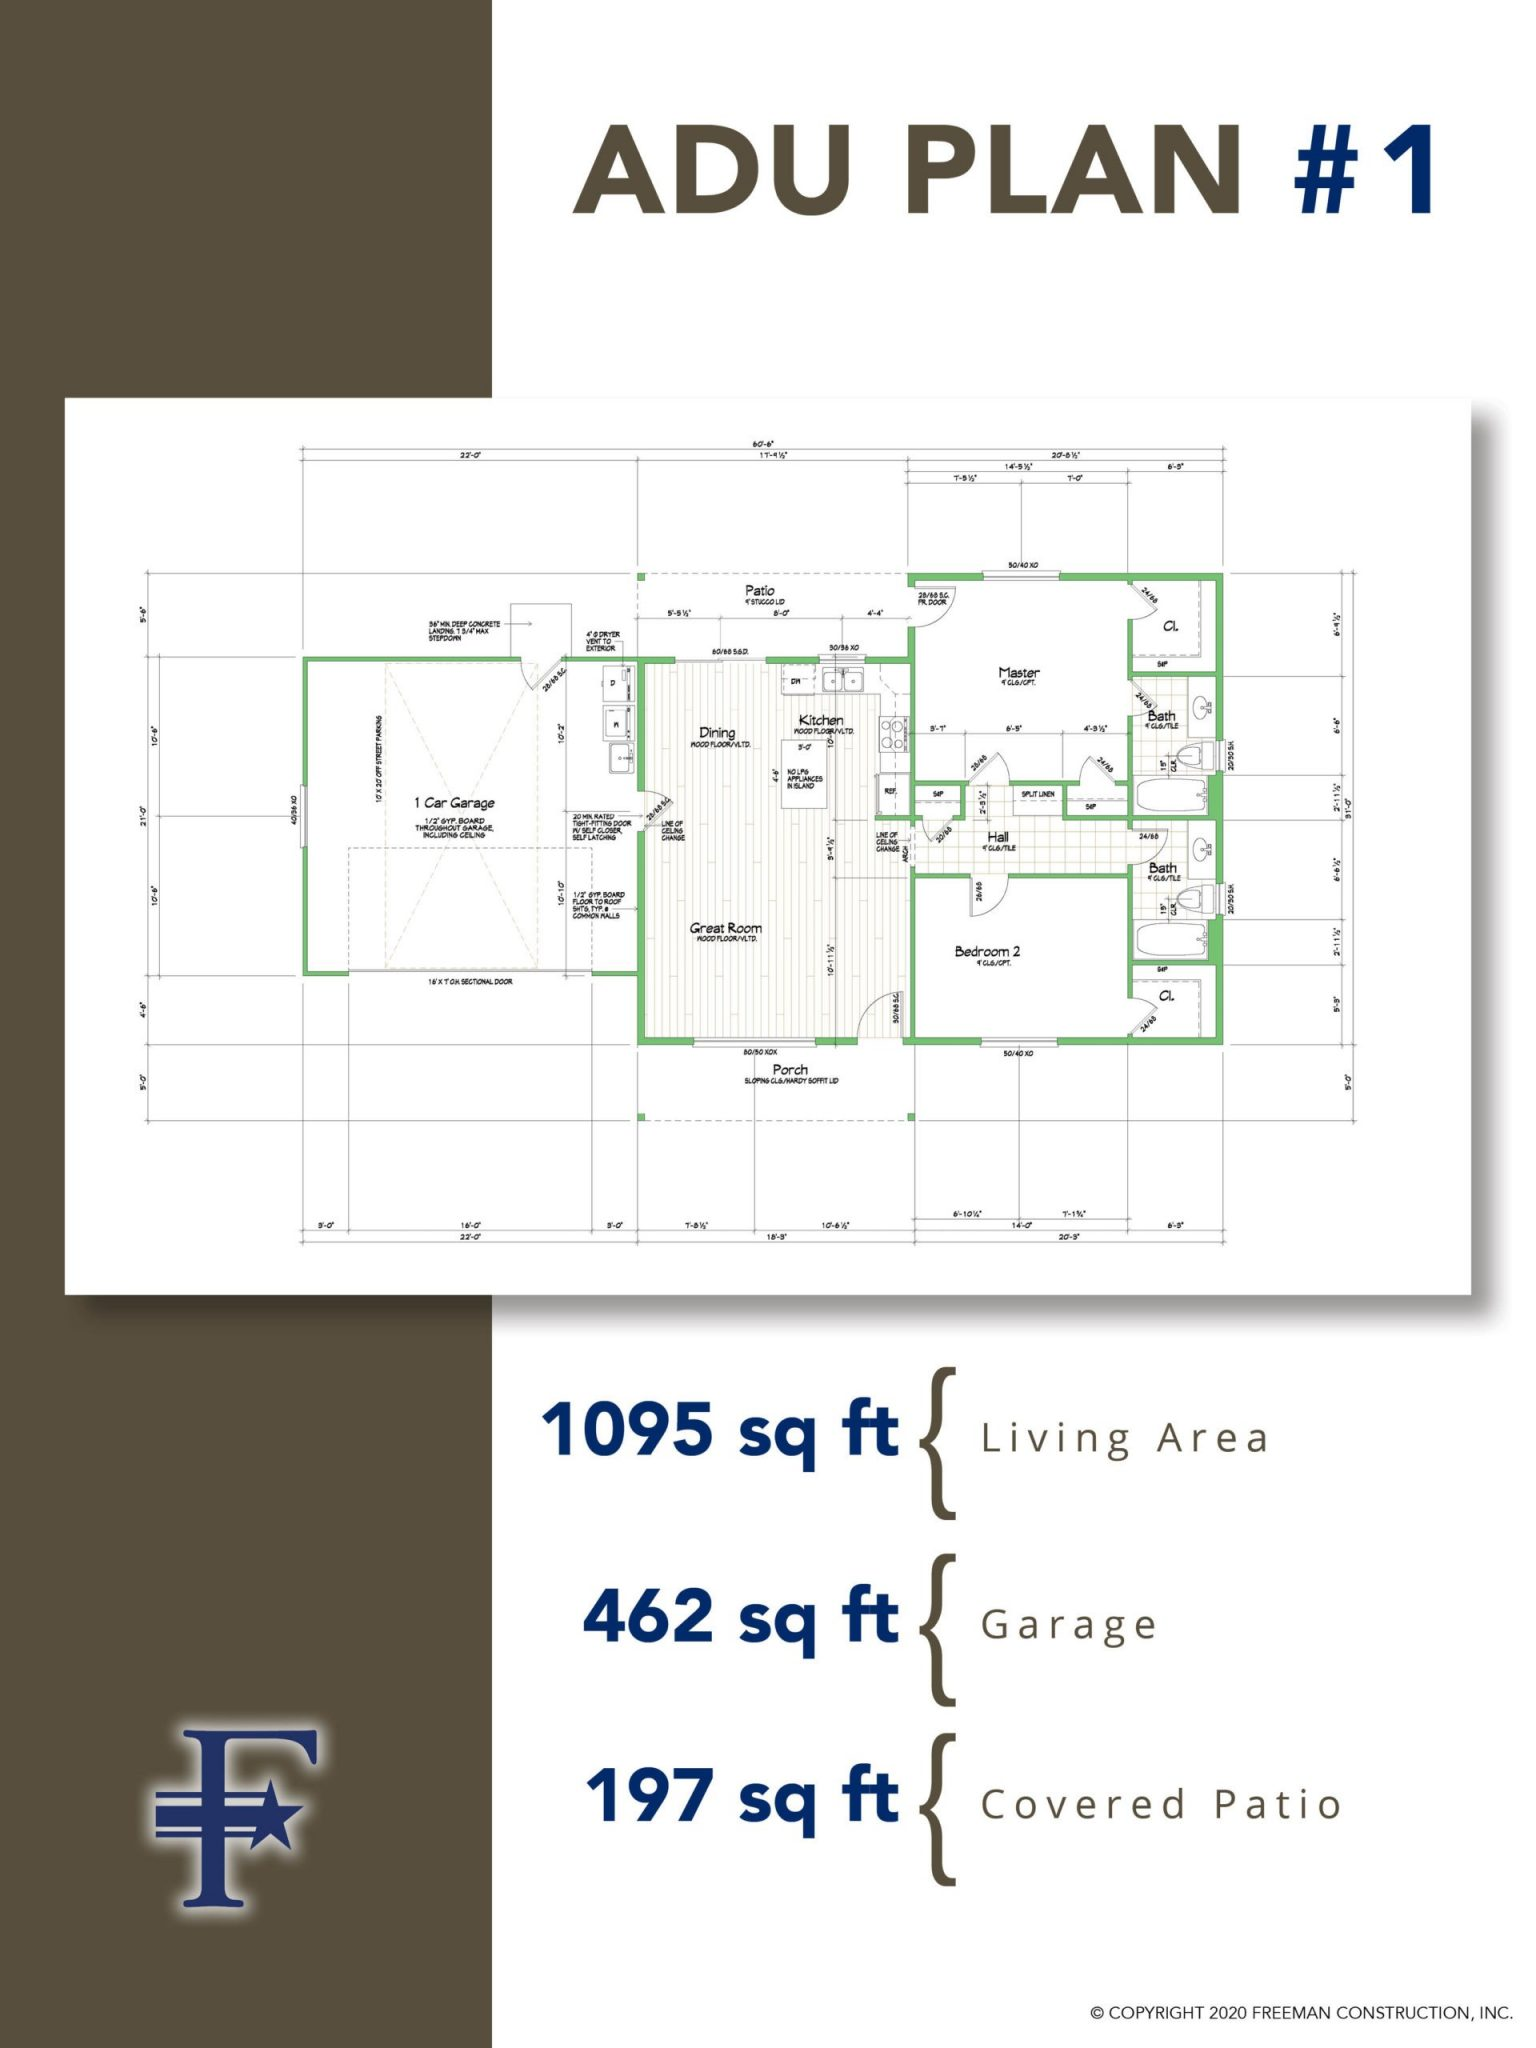 plan#1-adu-floor-plan